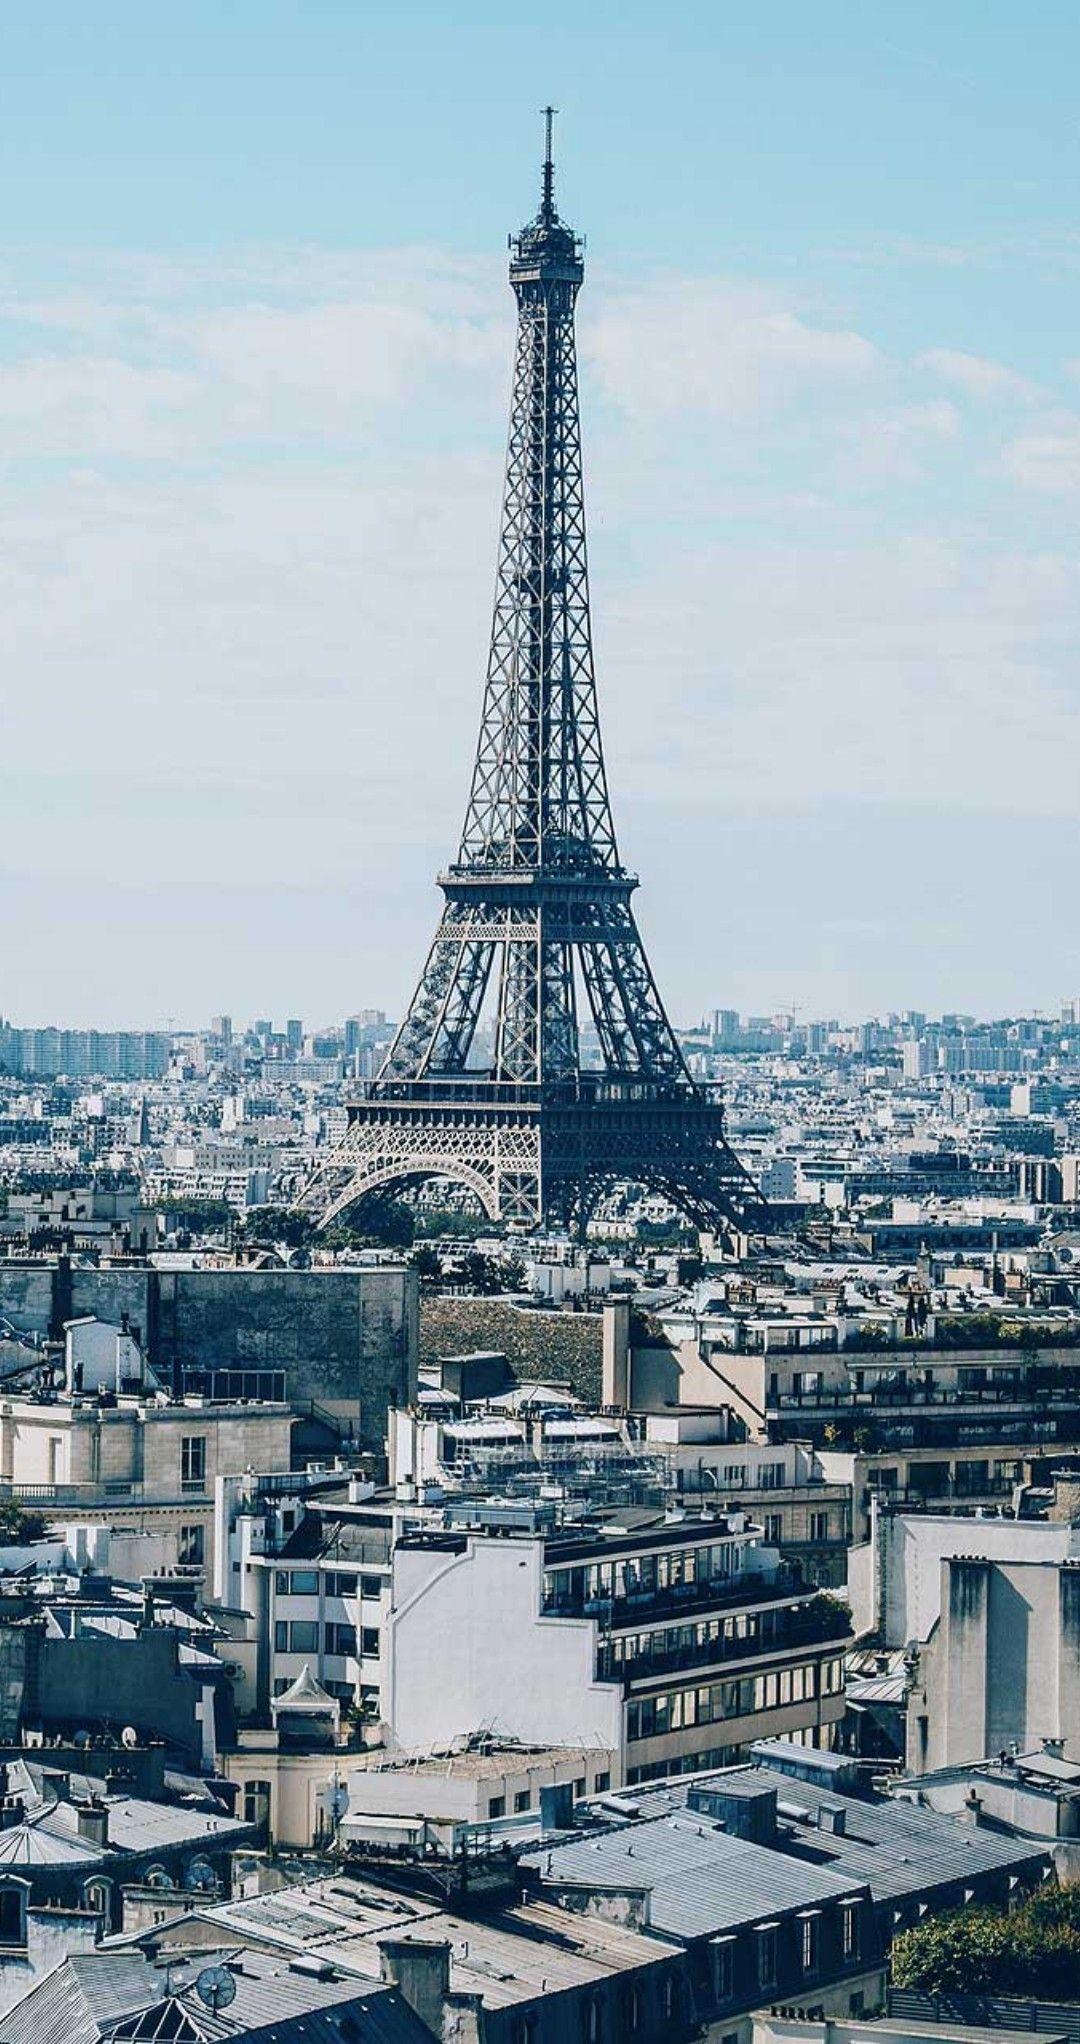 Pin by NikklaDesigns on Paris Wallpaper Paris wallpaper